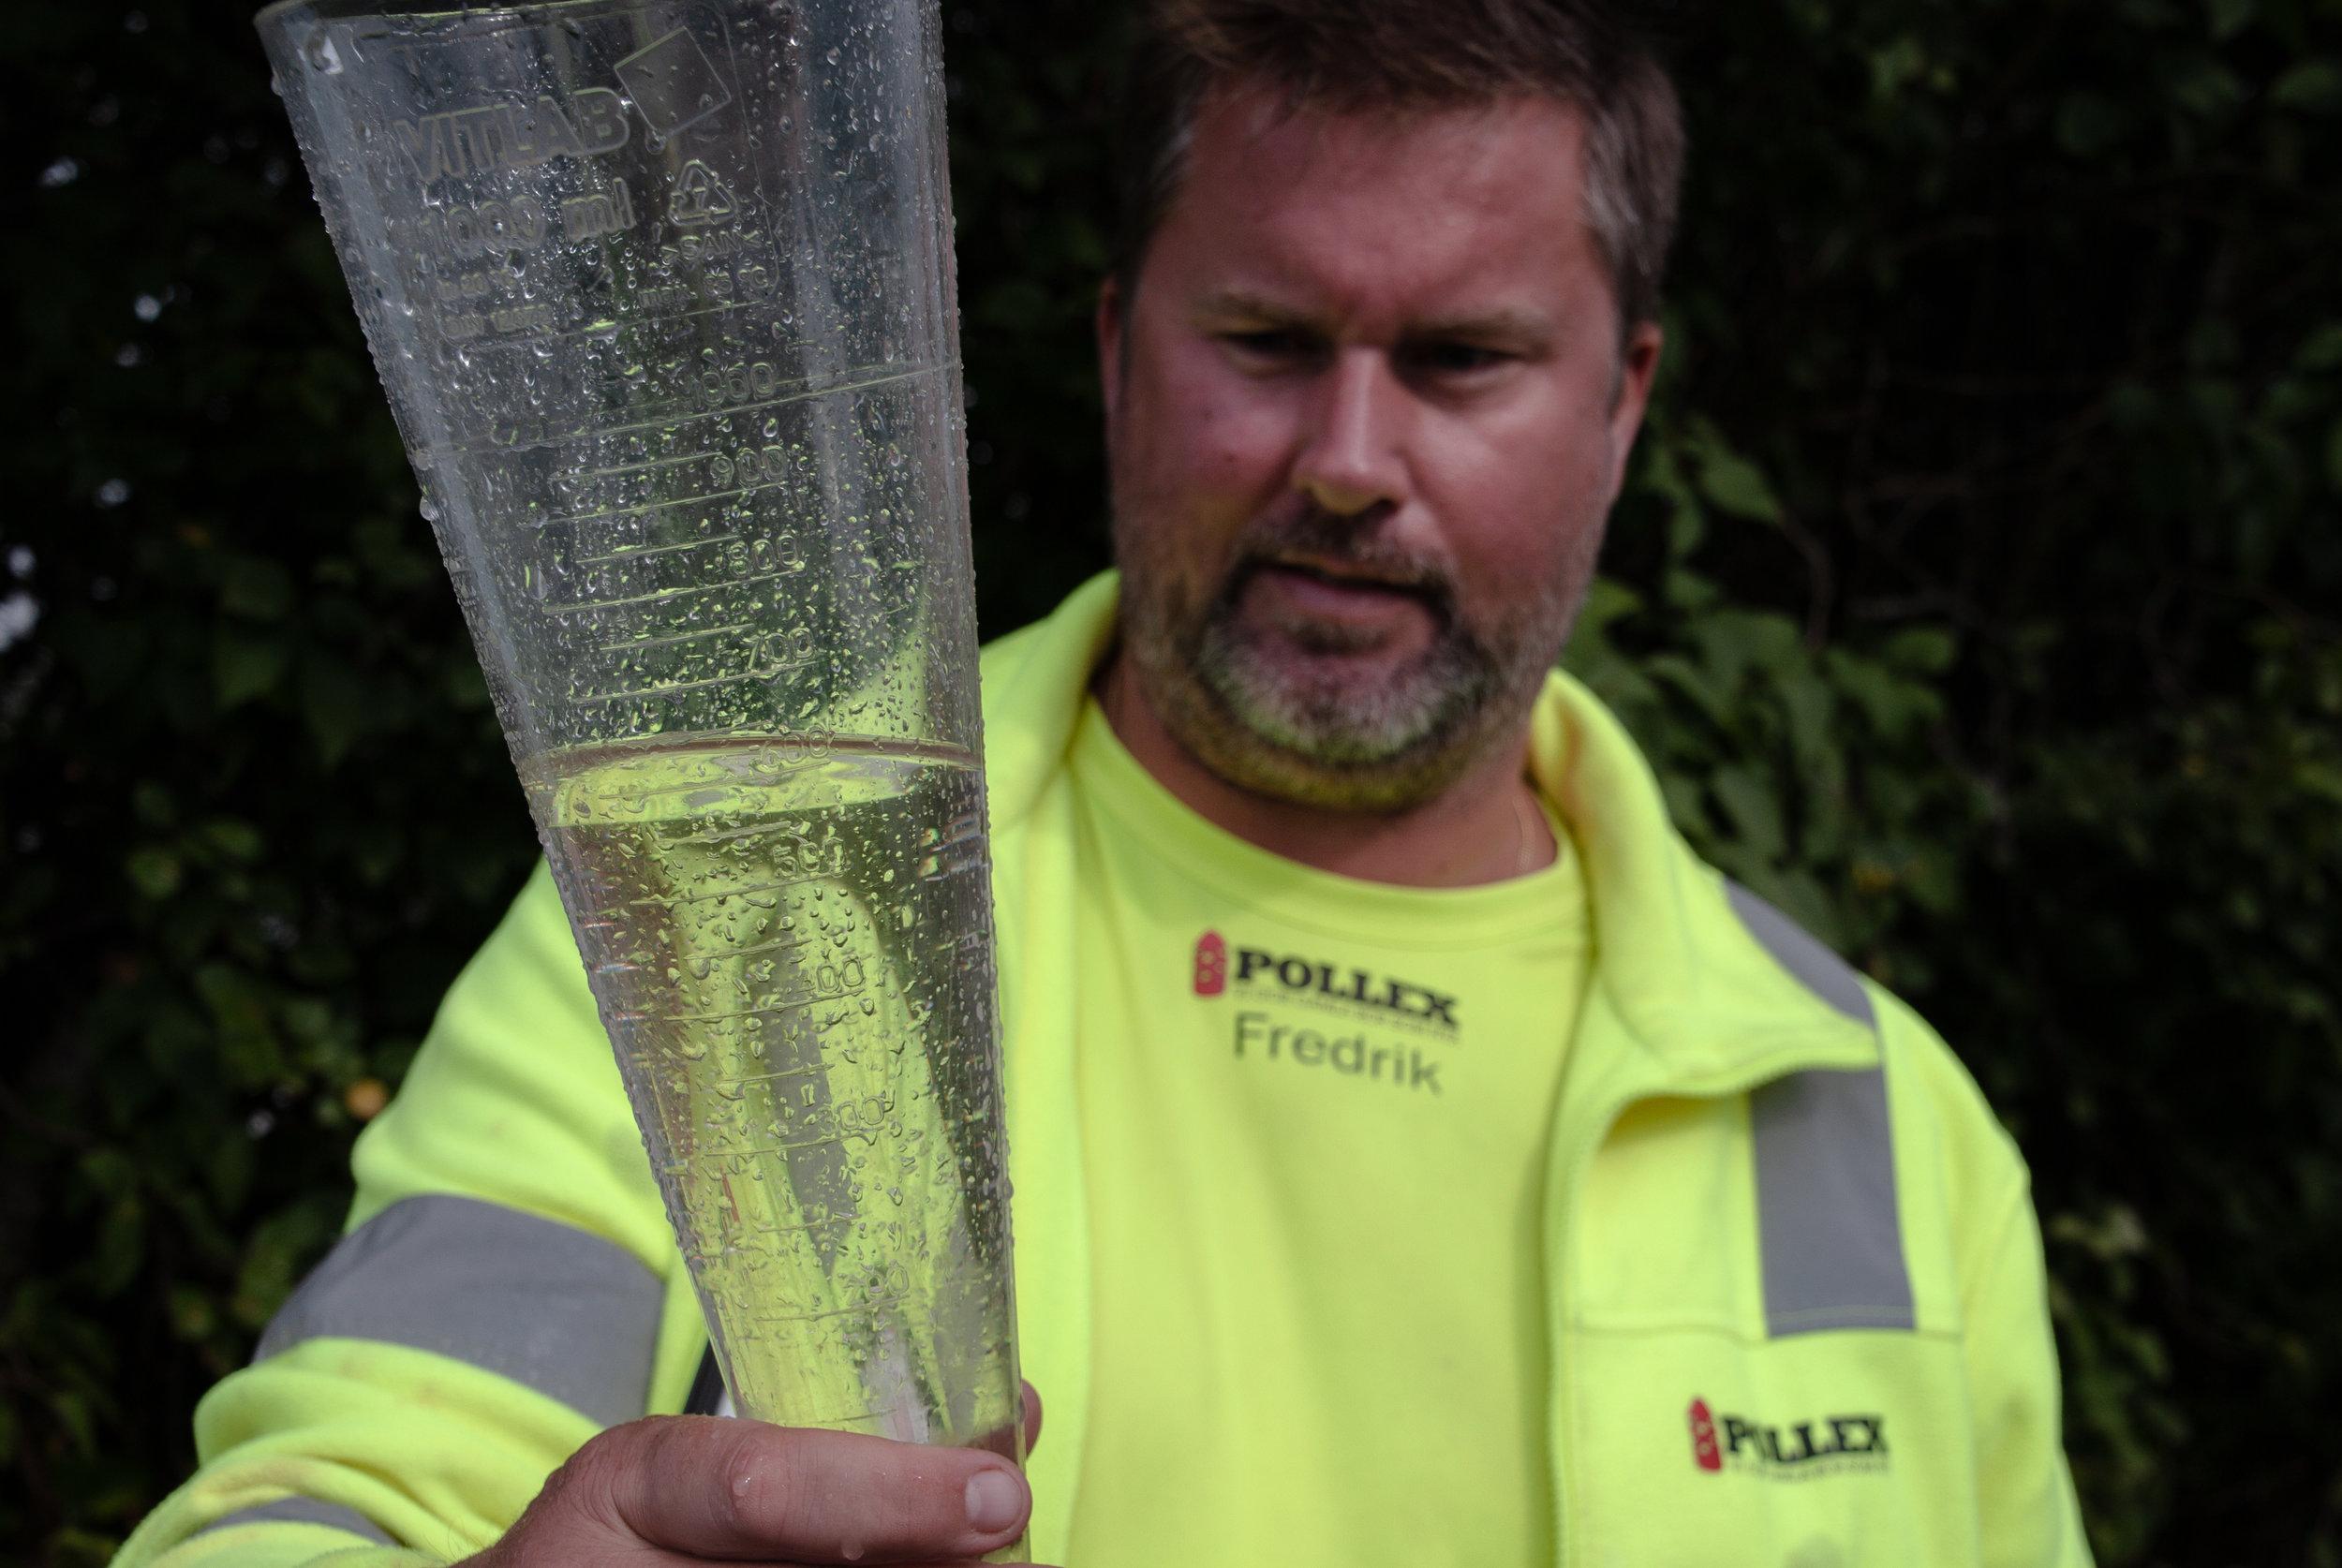 pollex-luftvattenspolning-vatten-luft-rent-prov.jpg